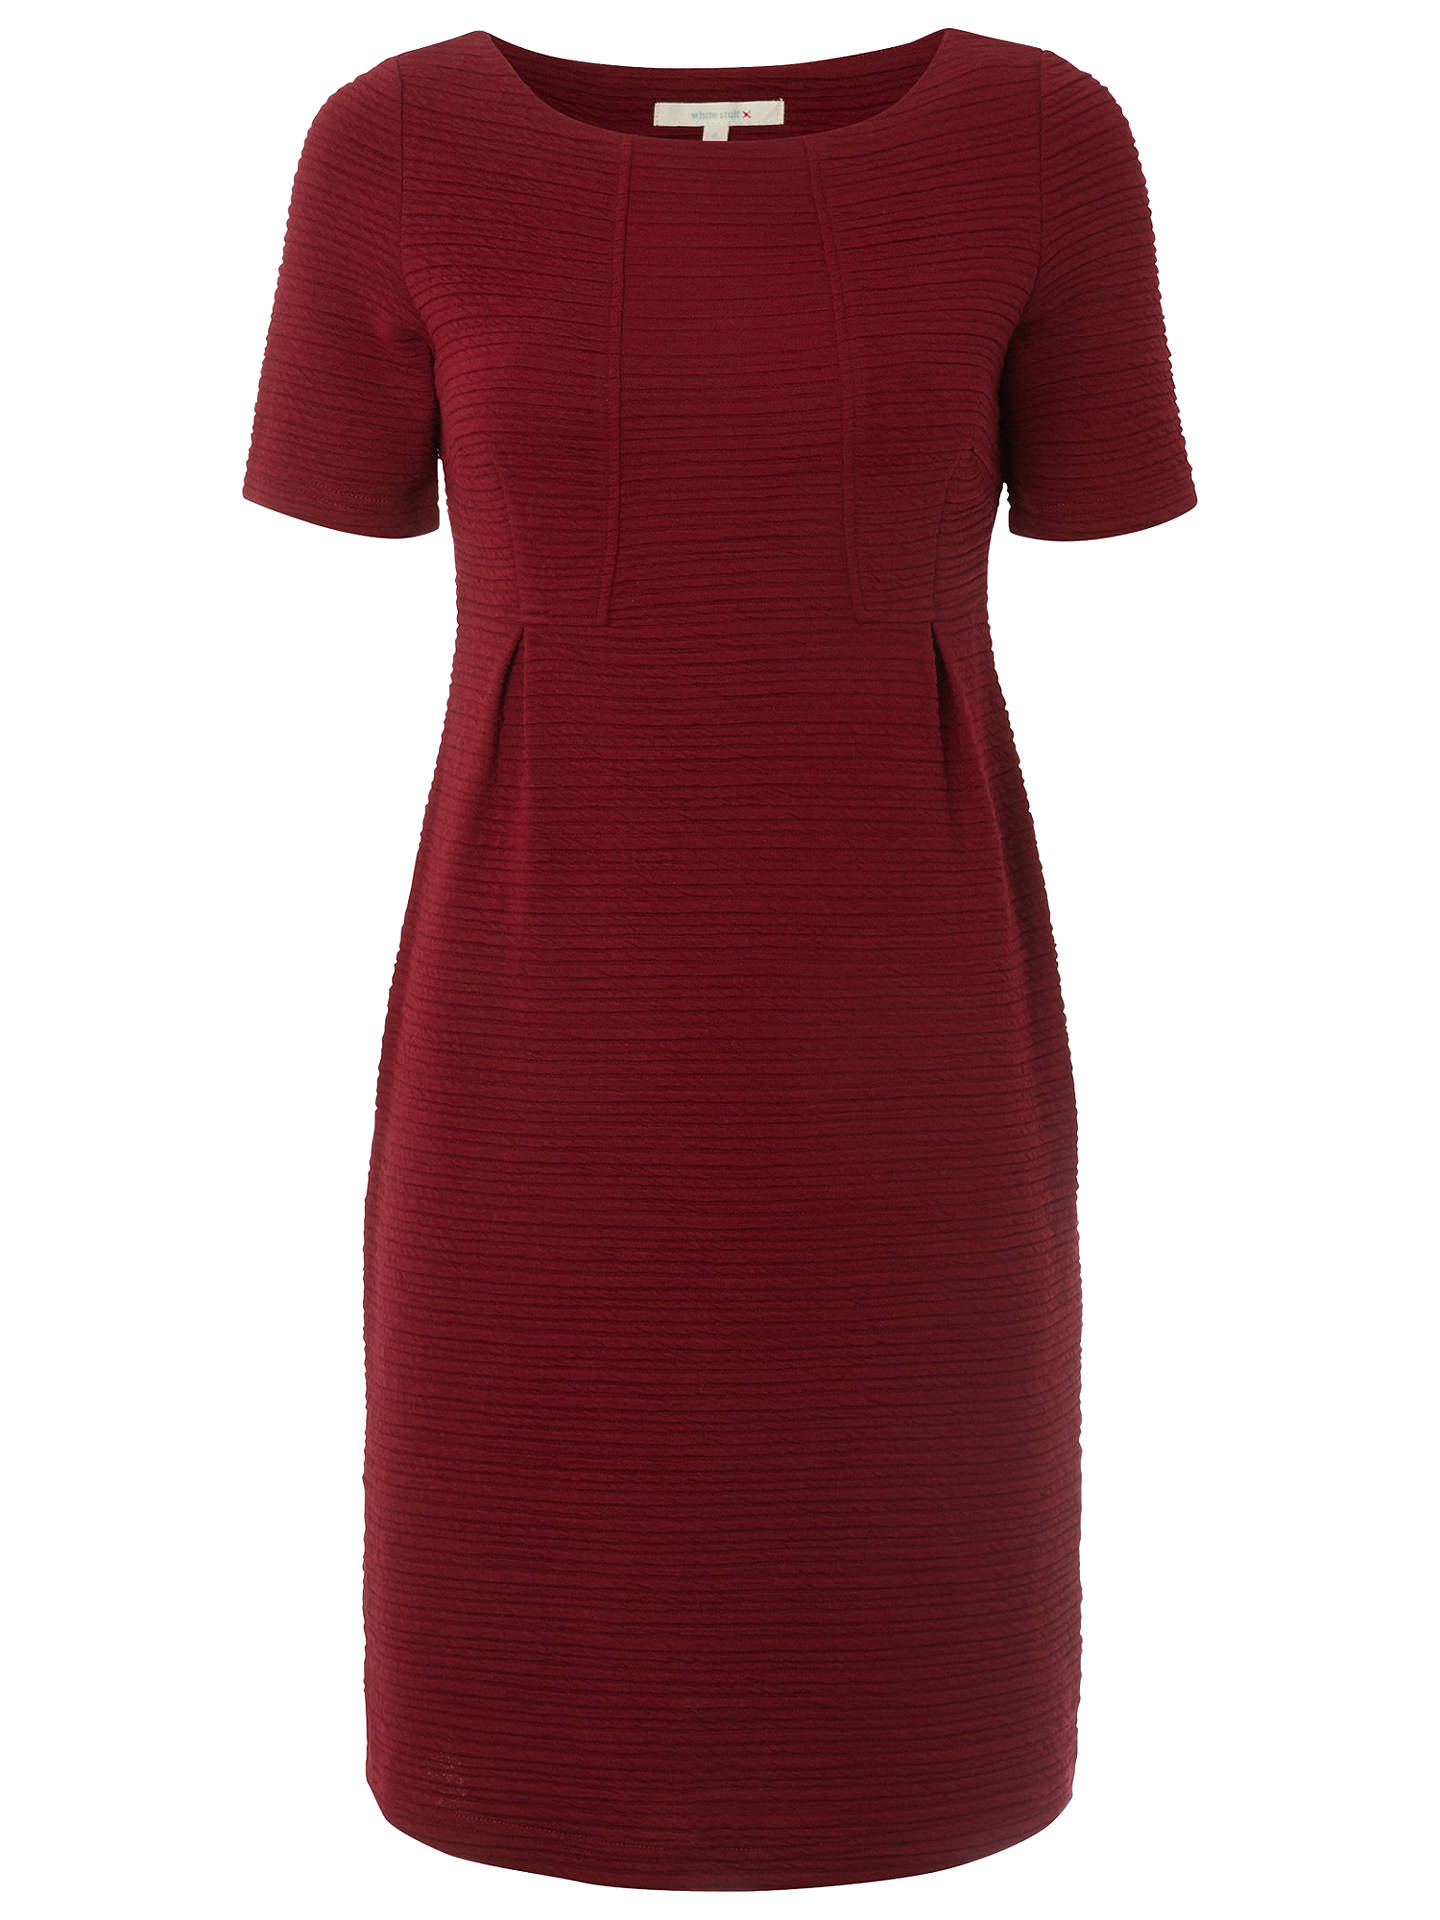 23eaba100fe7 Buy White Stuff Suzanne Textured Dress